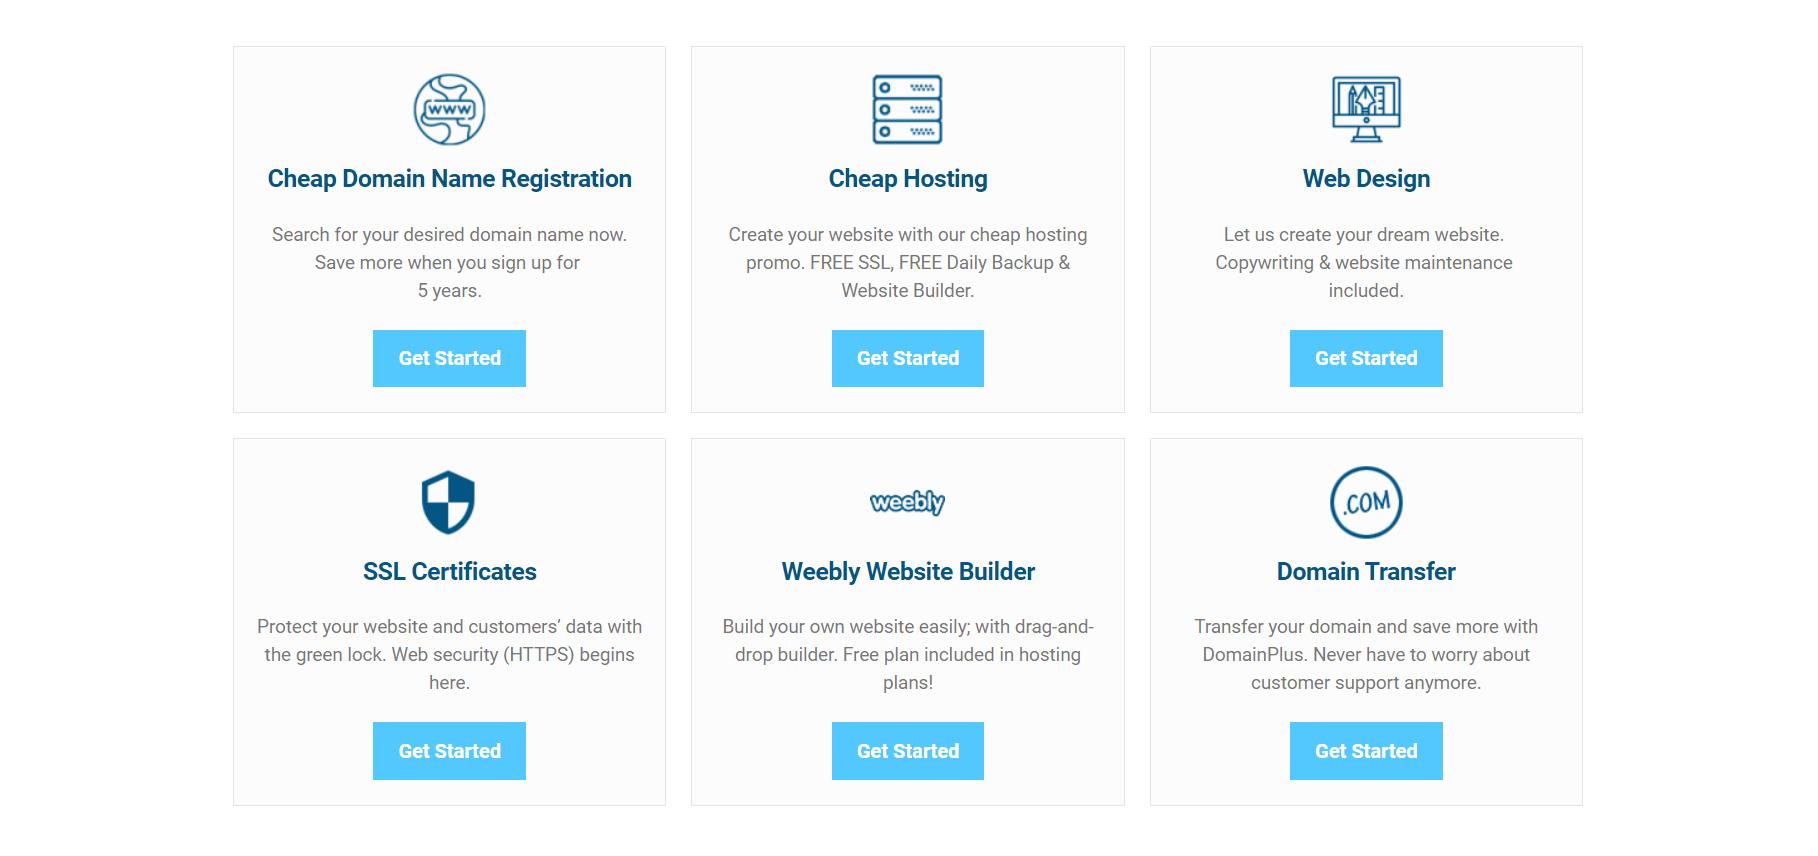 domainplus-features